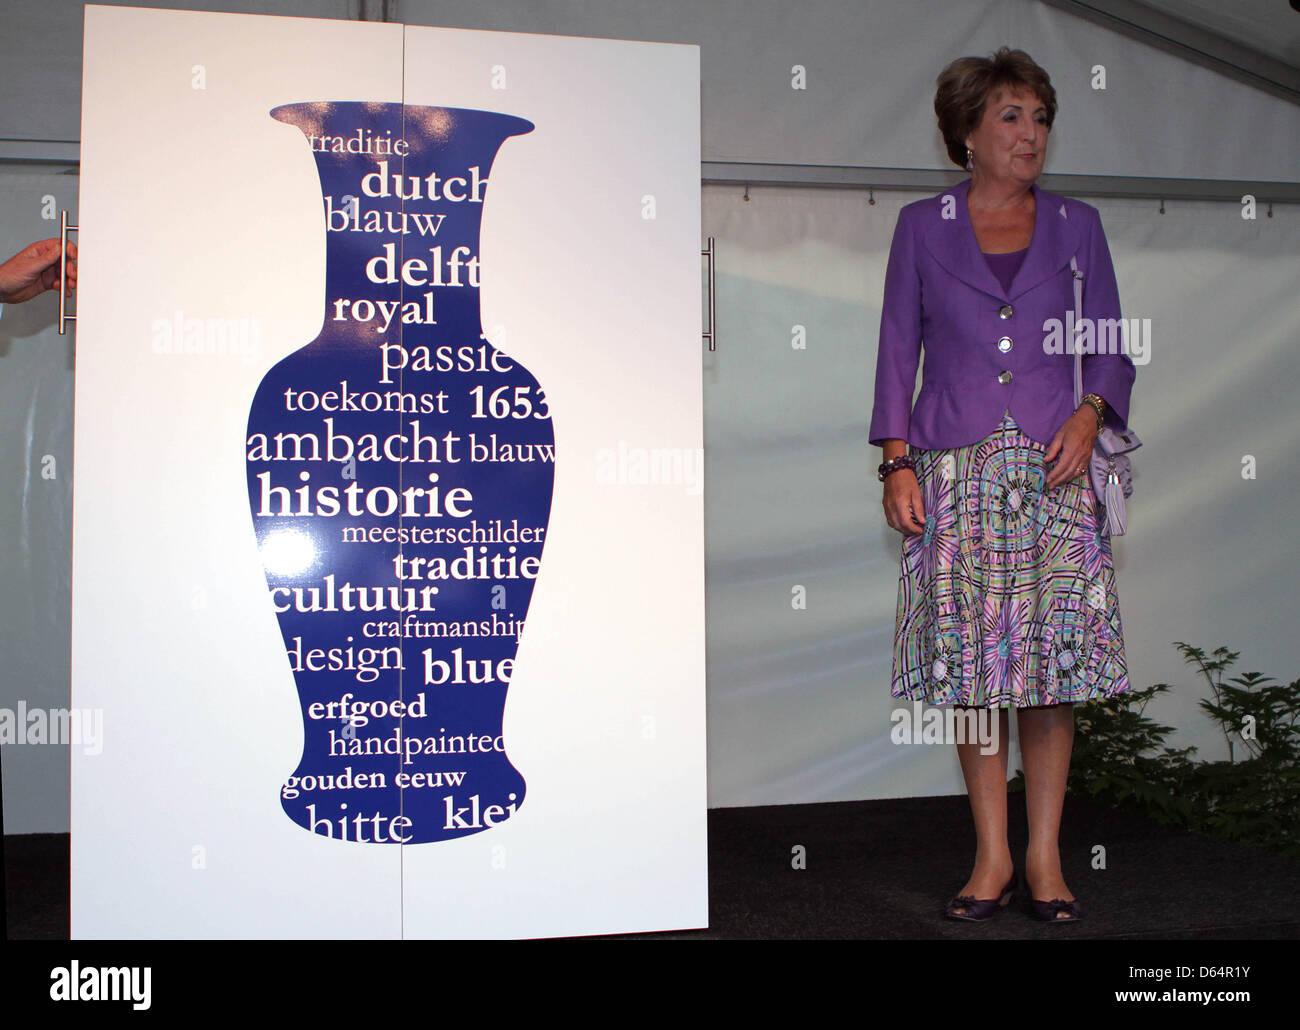 Dutch Princess Margriet HRH Princess Margriet opens the Royal Delft Experience, part of the Royal Delft pottery - Stock Image